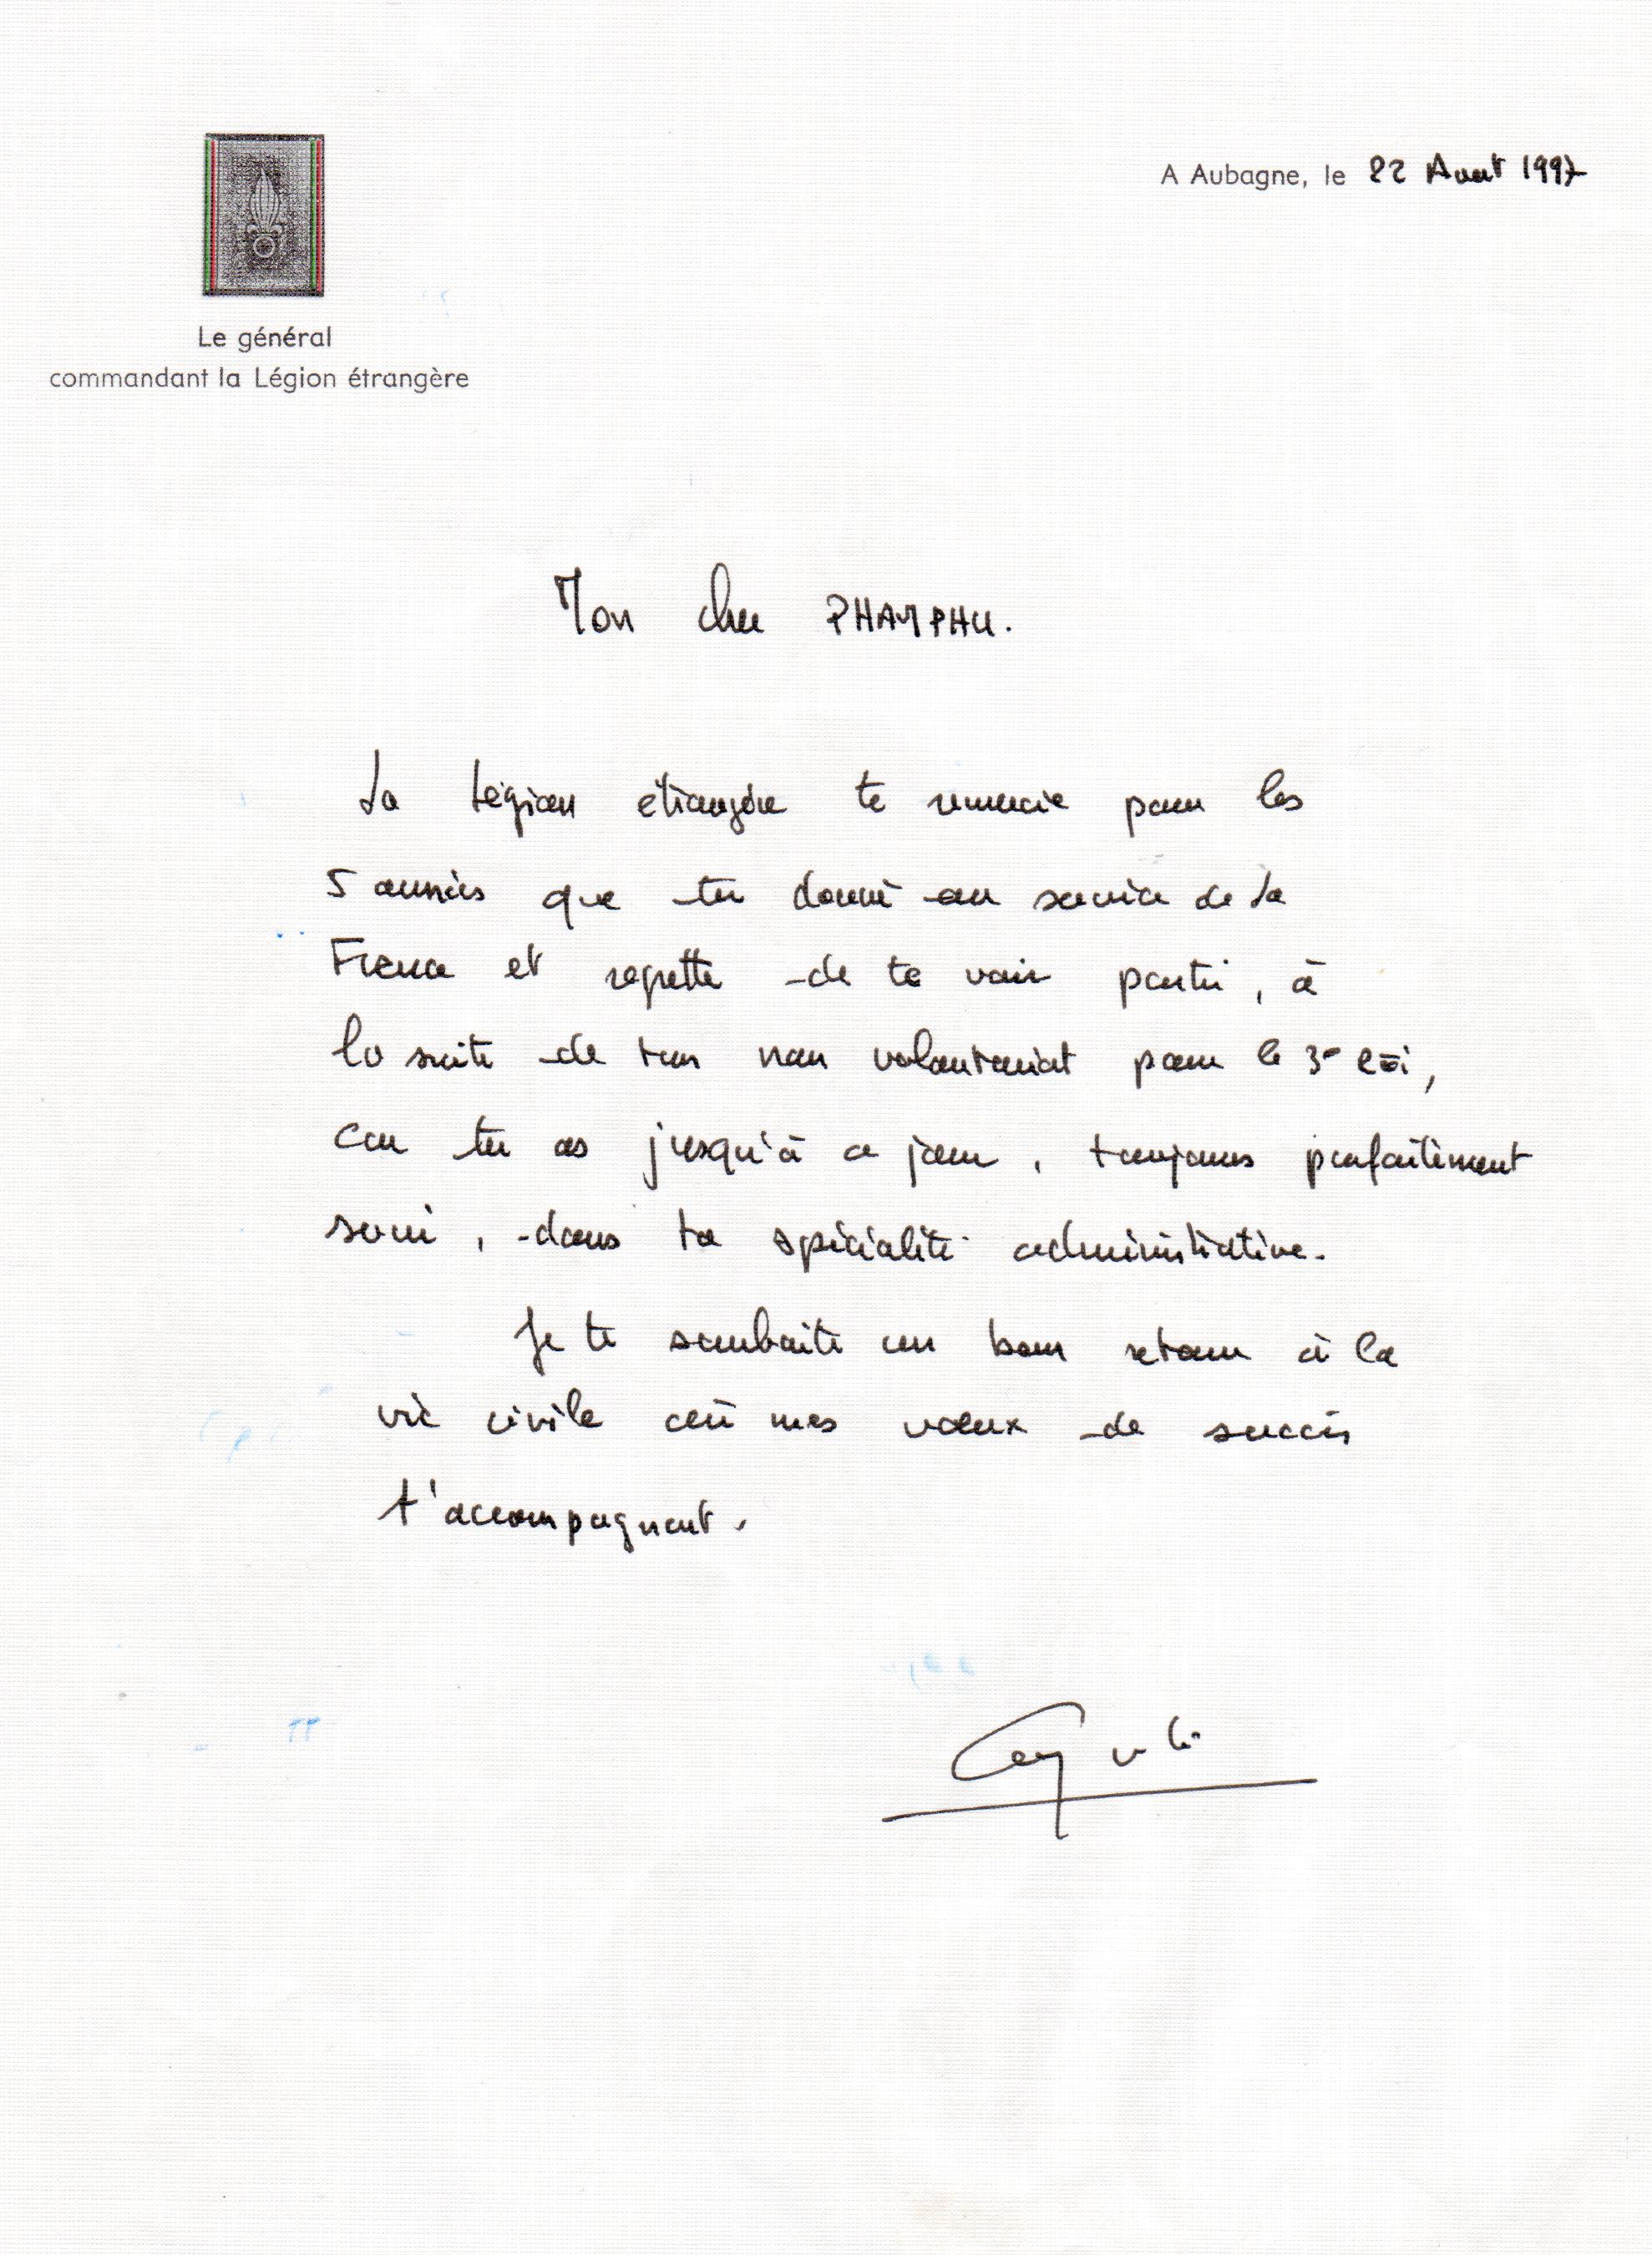 lettre-du-general.jpg